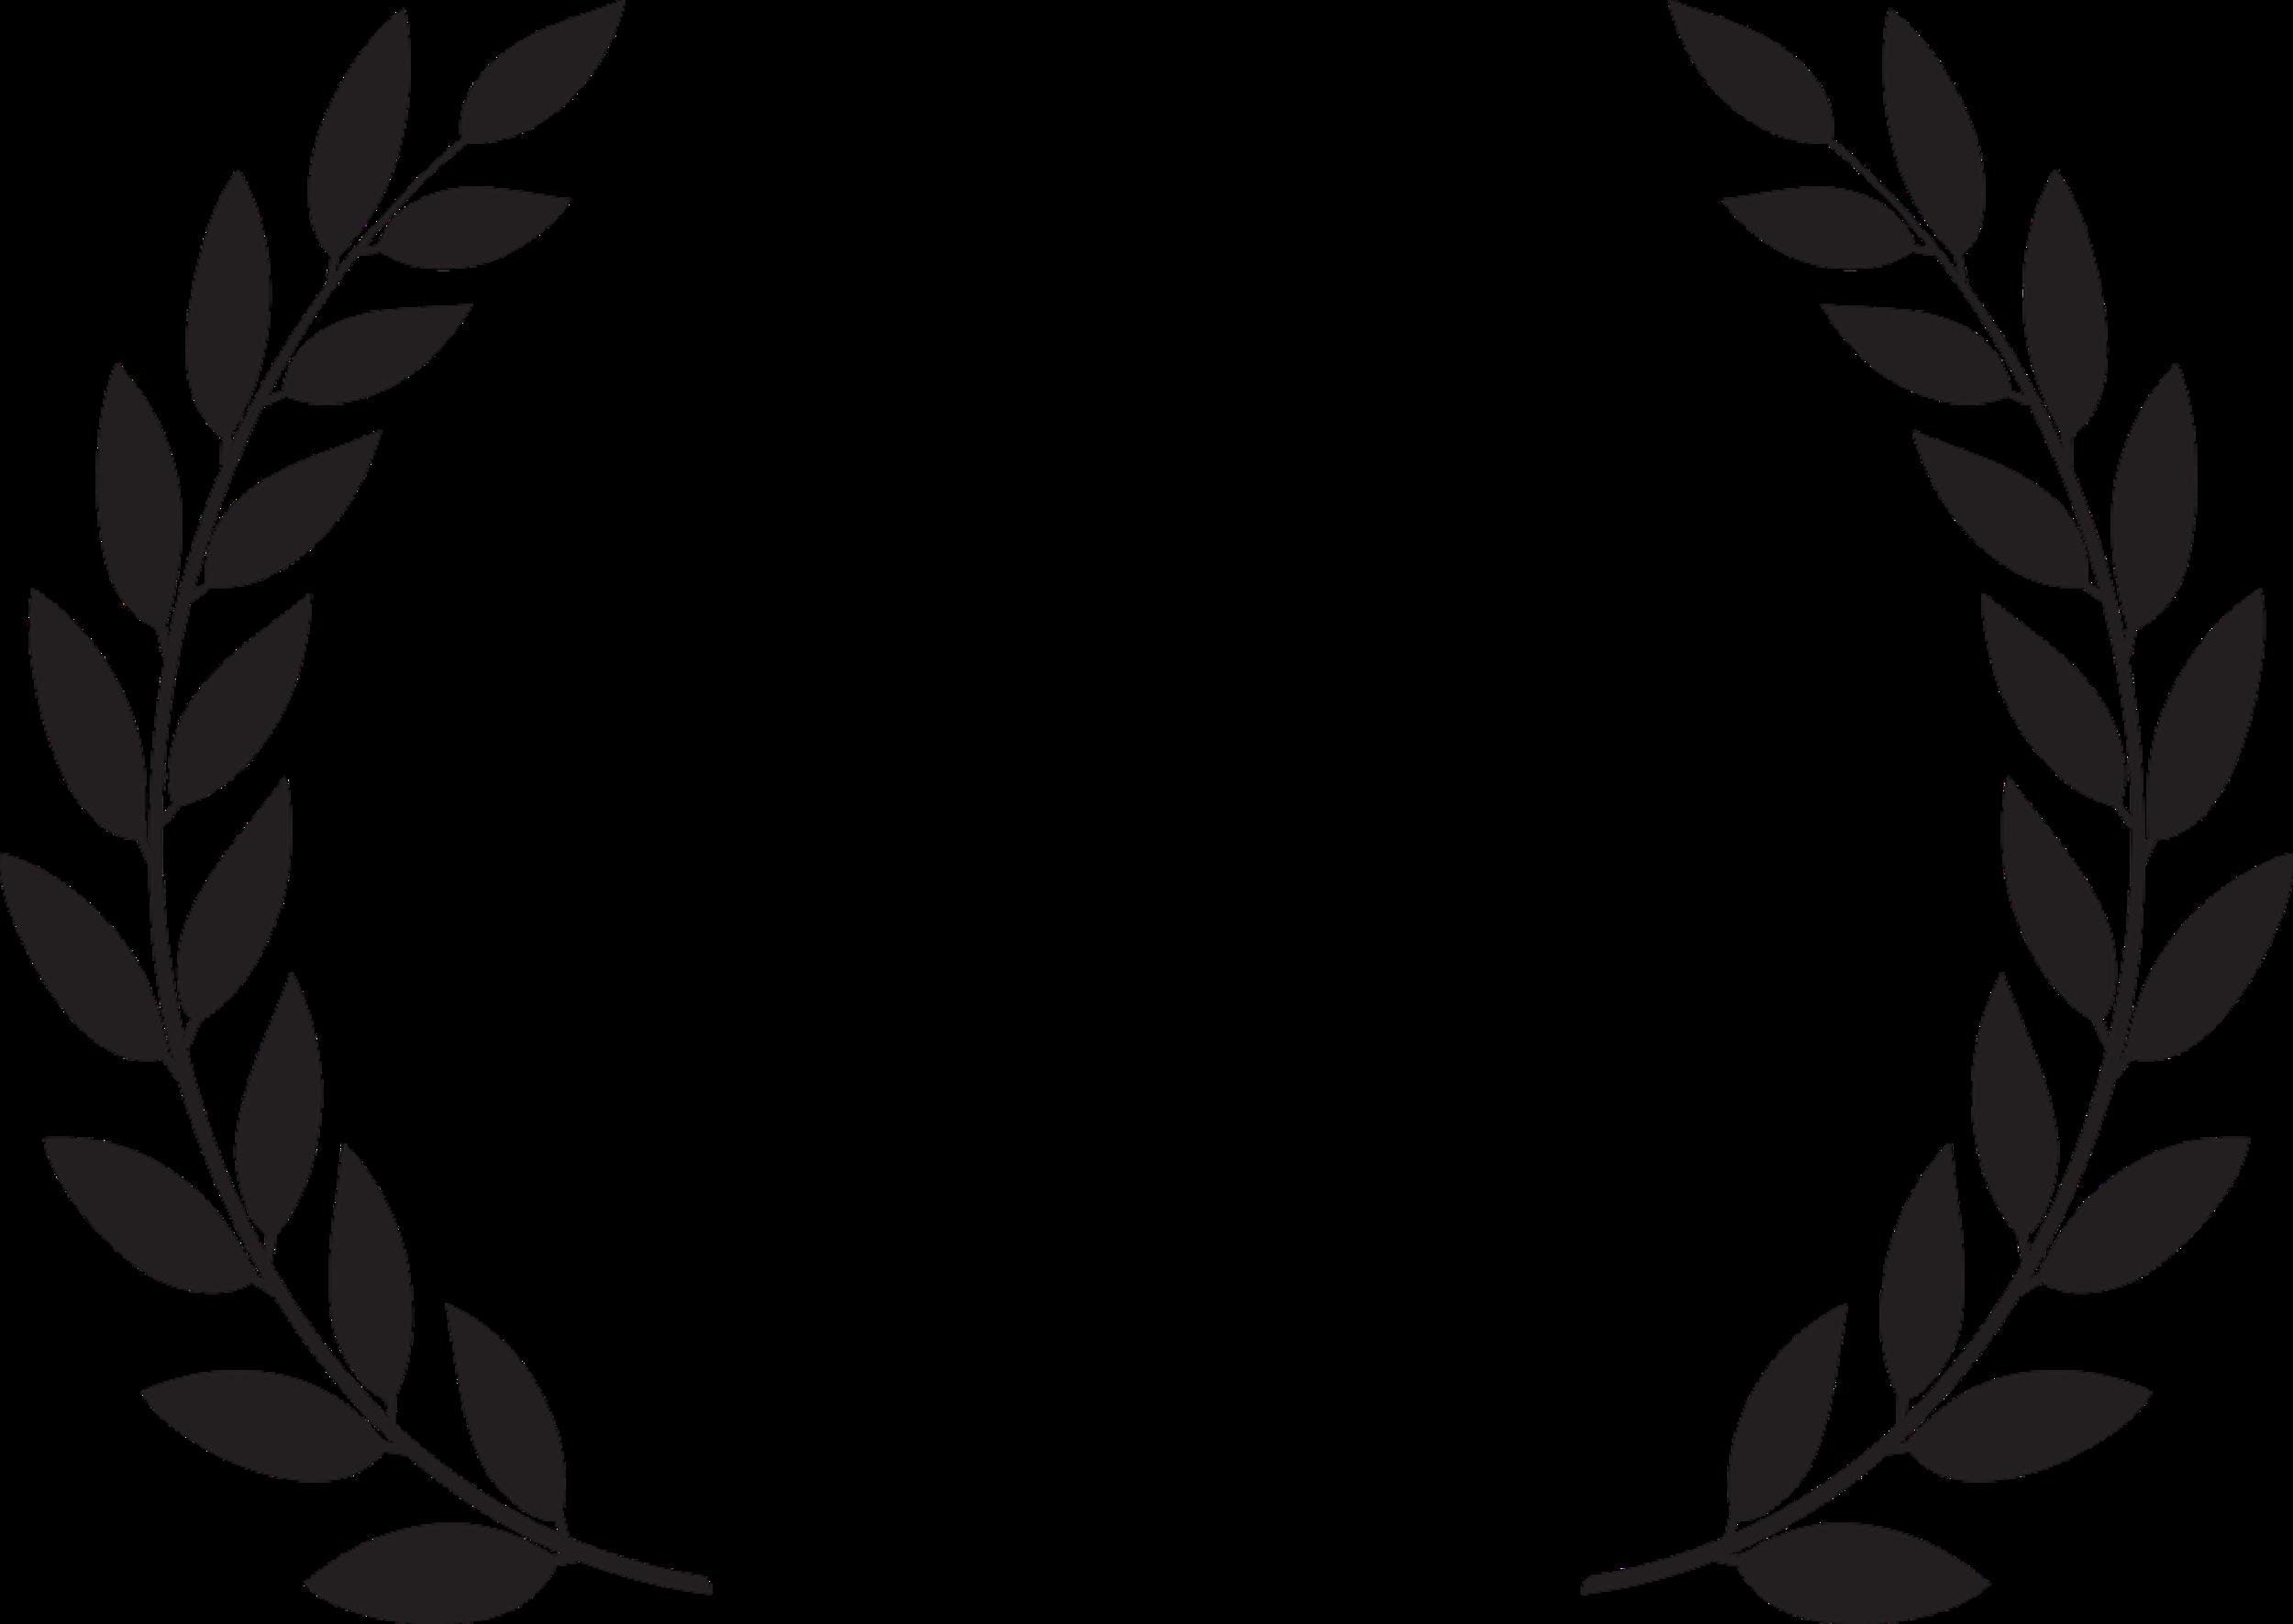 Strut - Hollyshorts Film Festival - 3000 x 2125.png